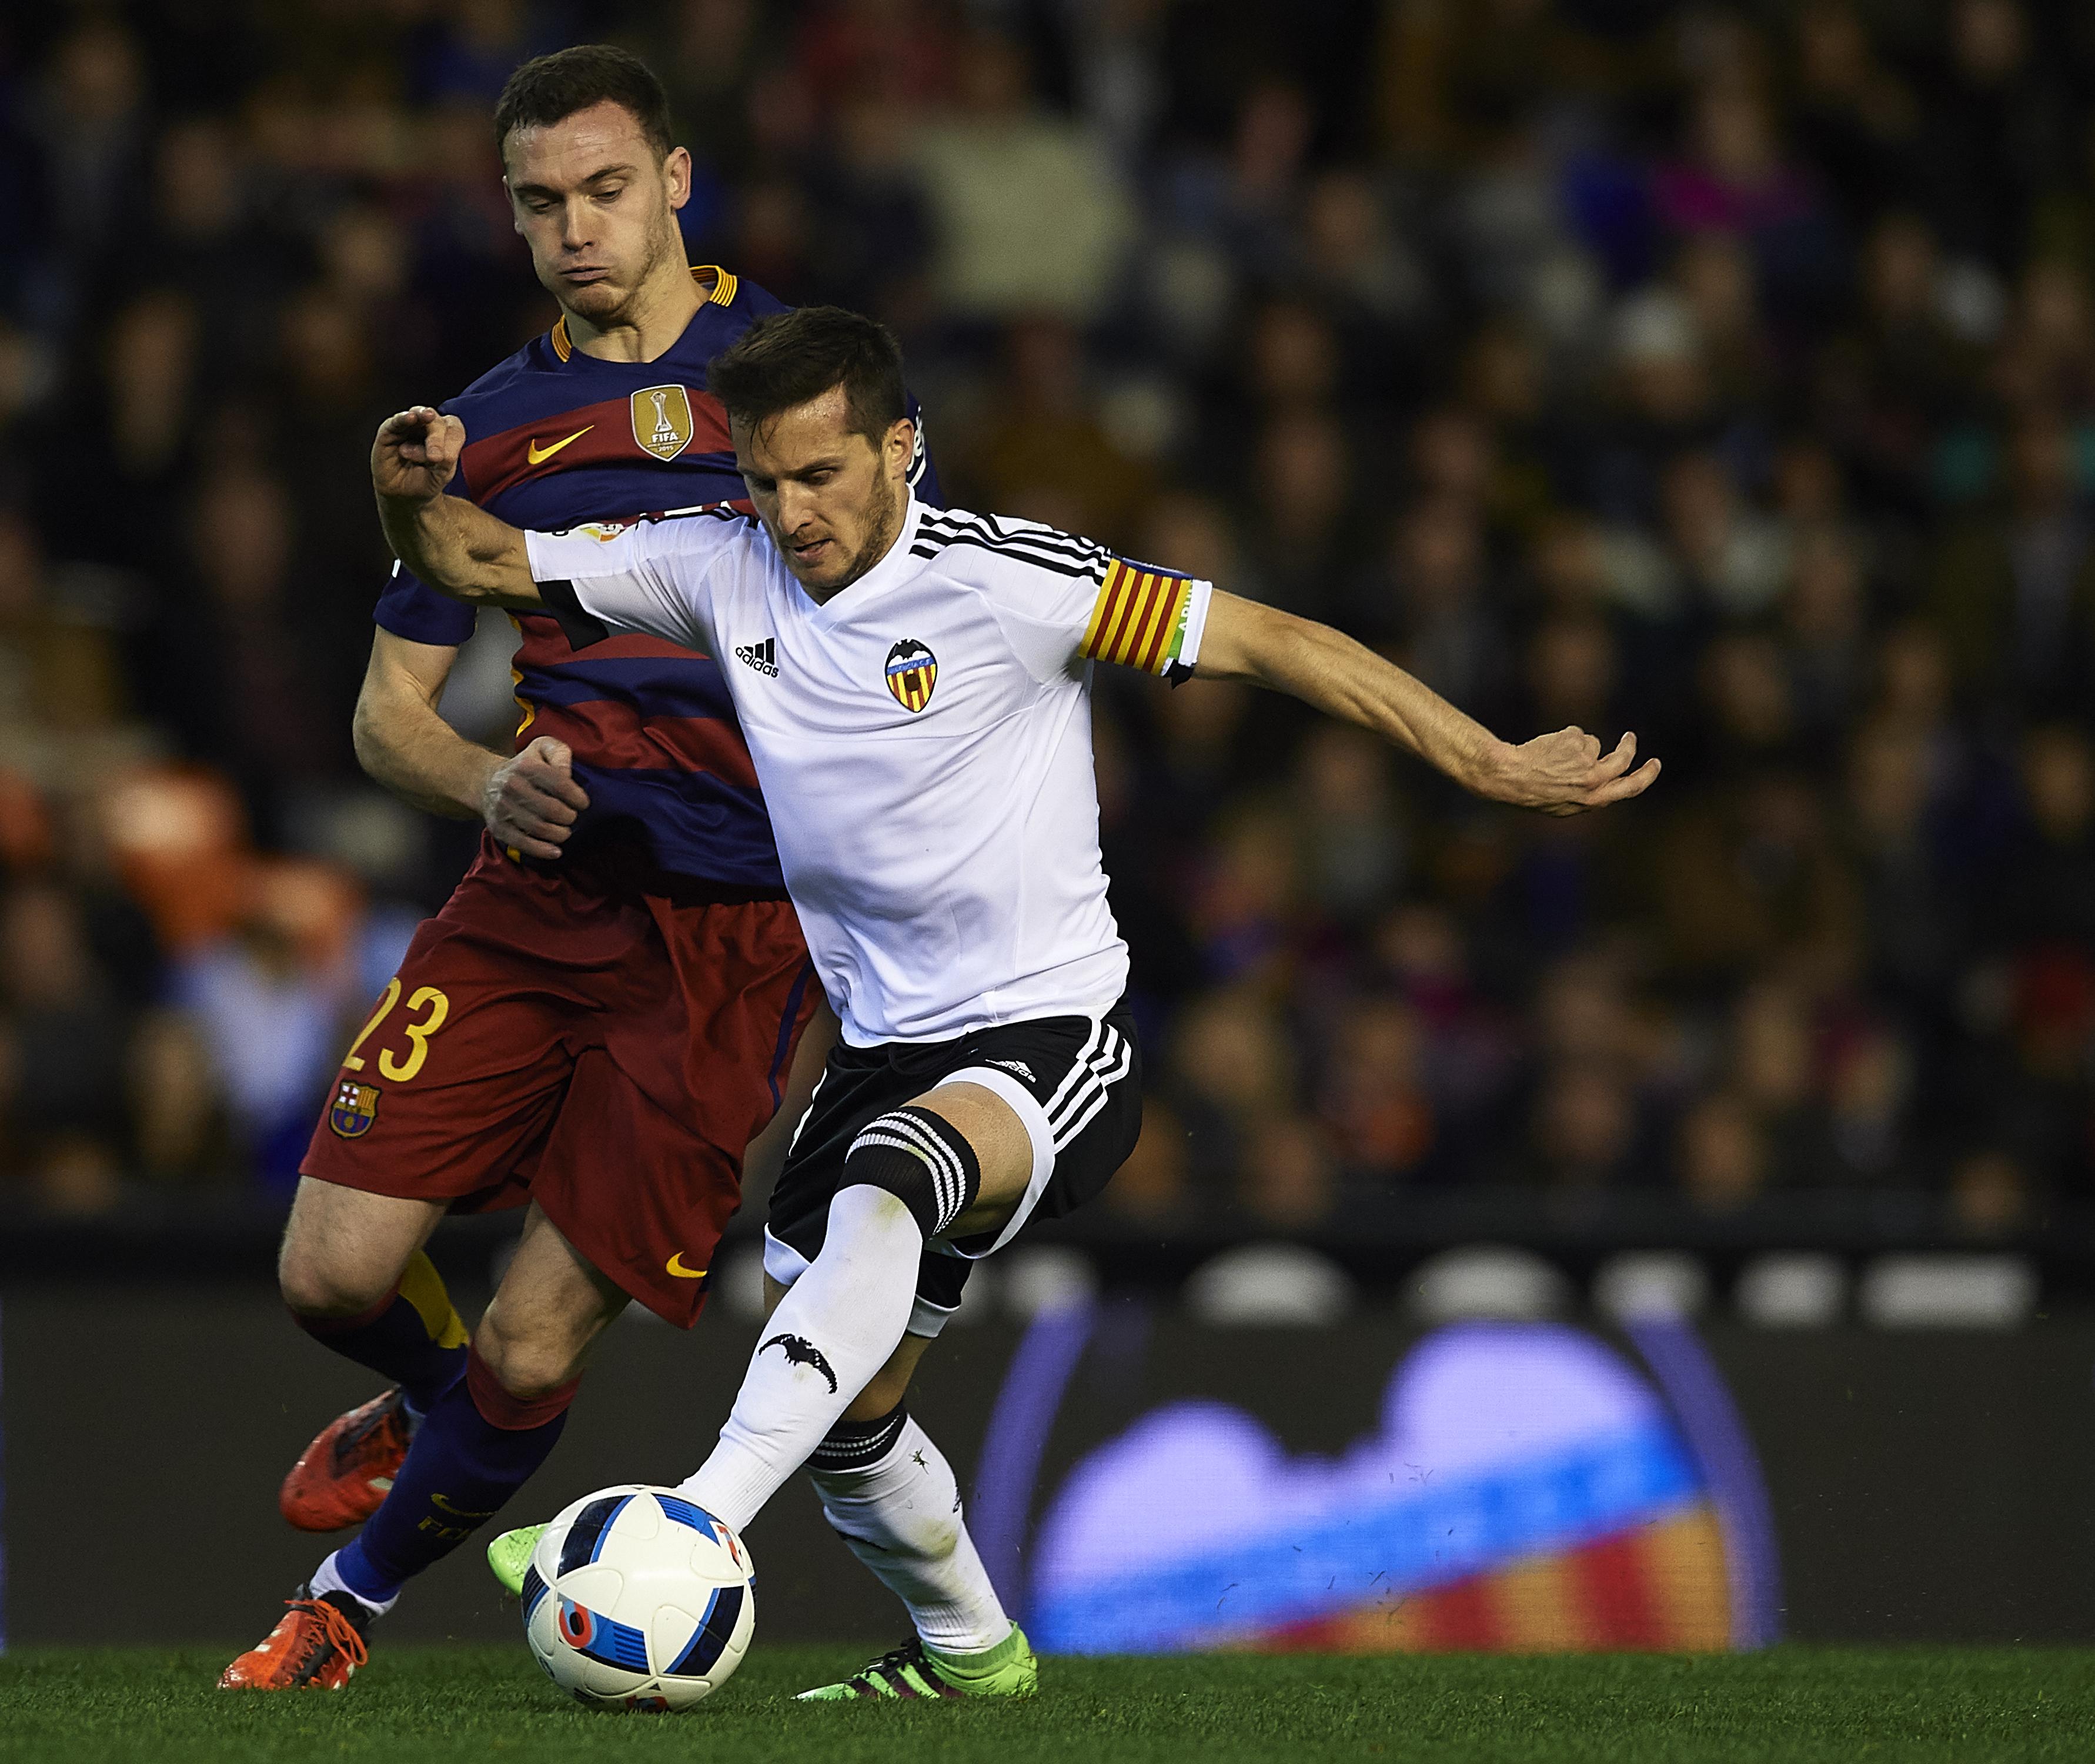 Aston Villa linked to FC Barcelona defender Thomas Vermaelen